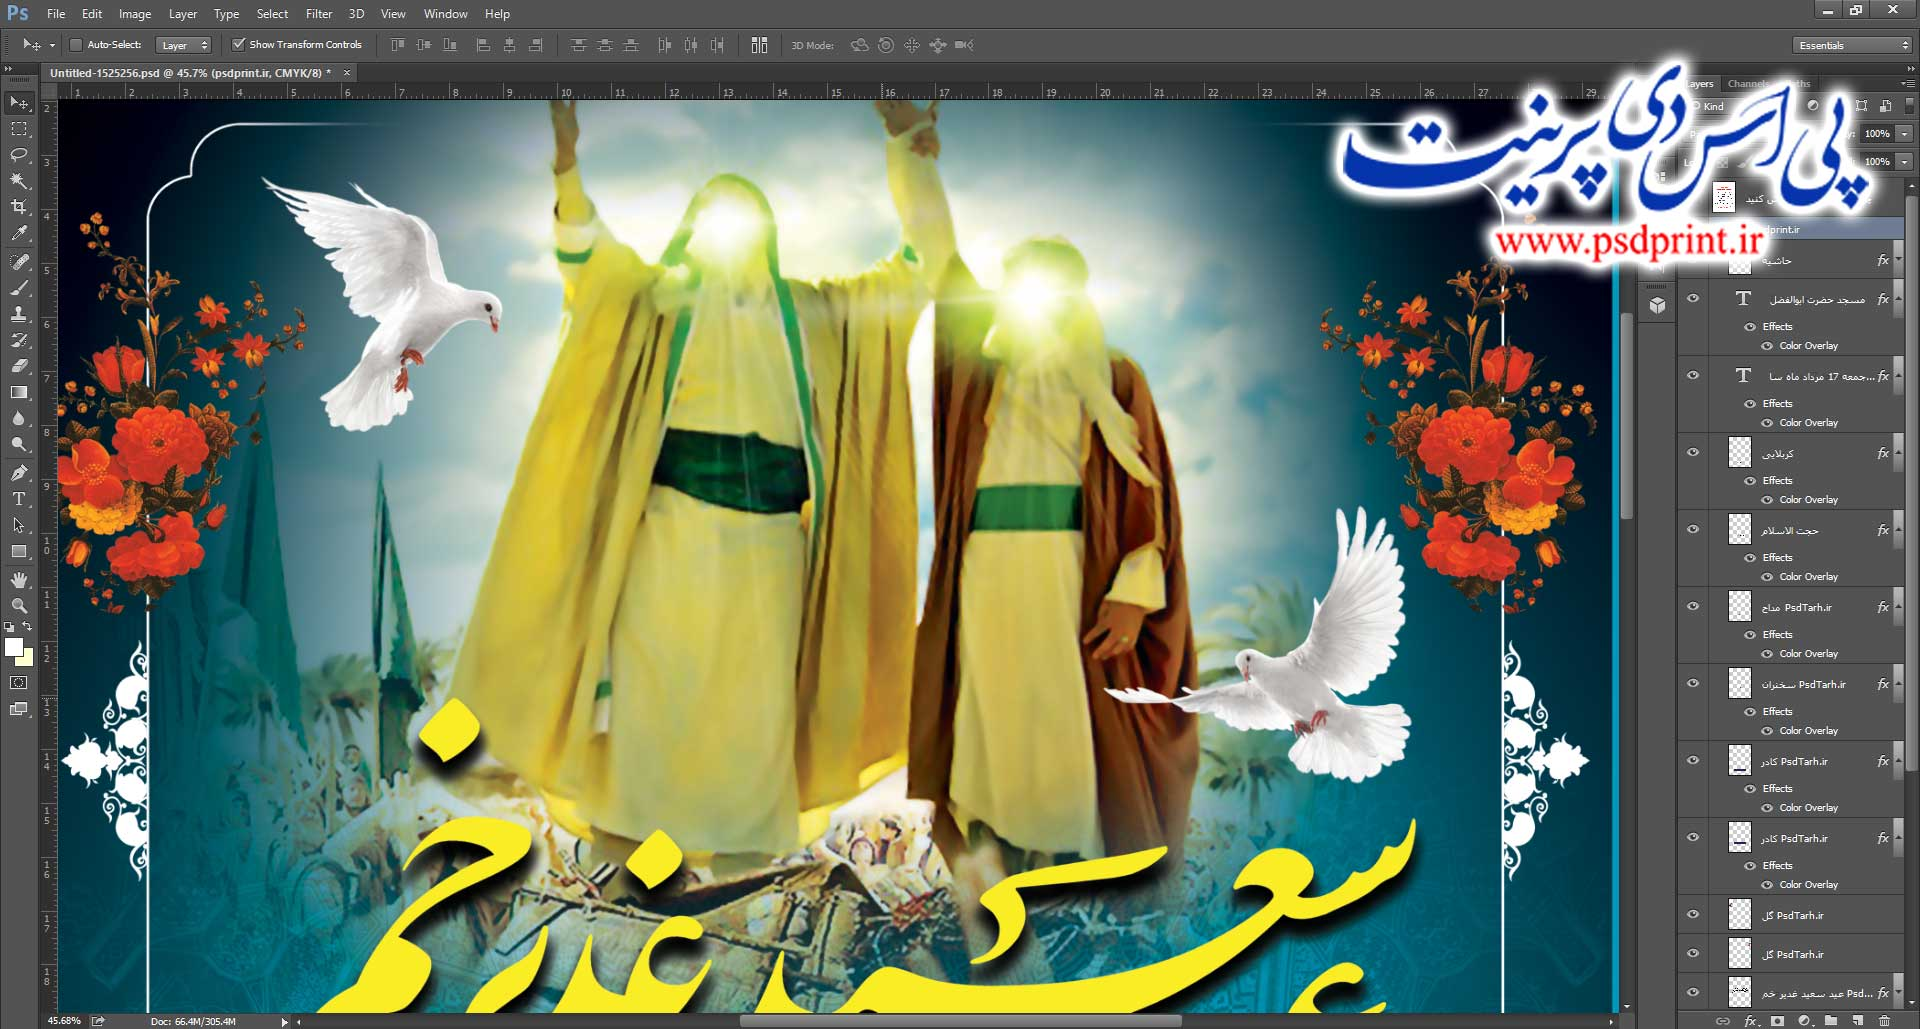 بنر اطلاع رسانی جشن عید غدیر خم